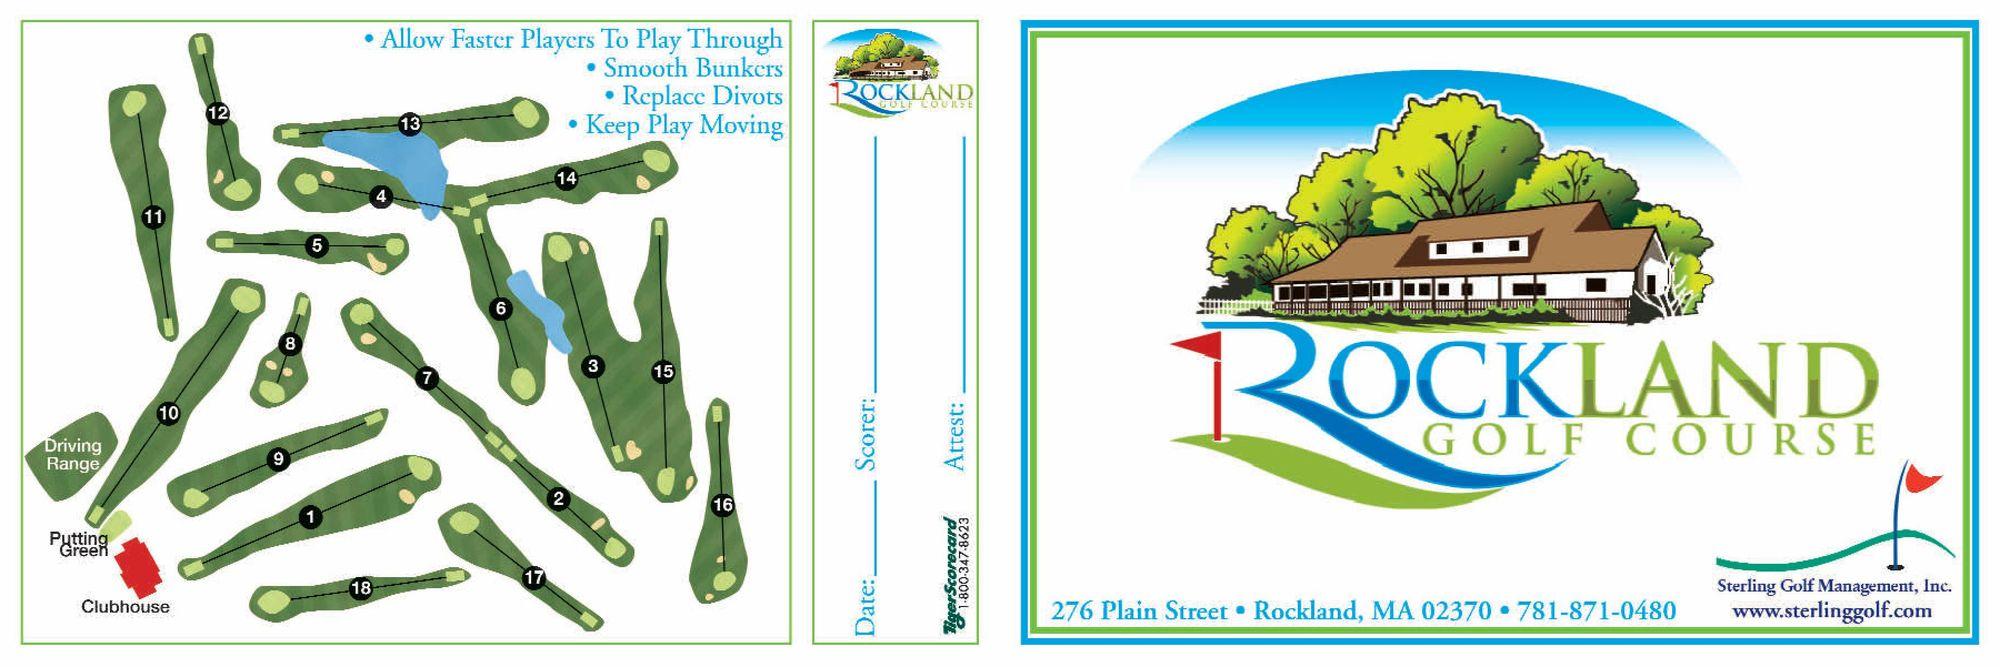 Rockland-Scorecard-1